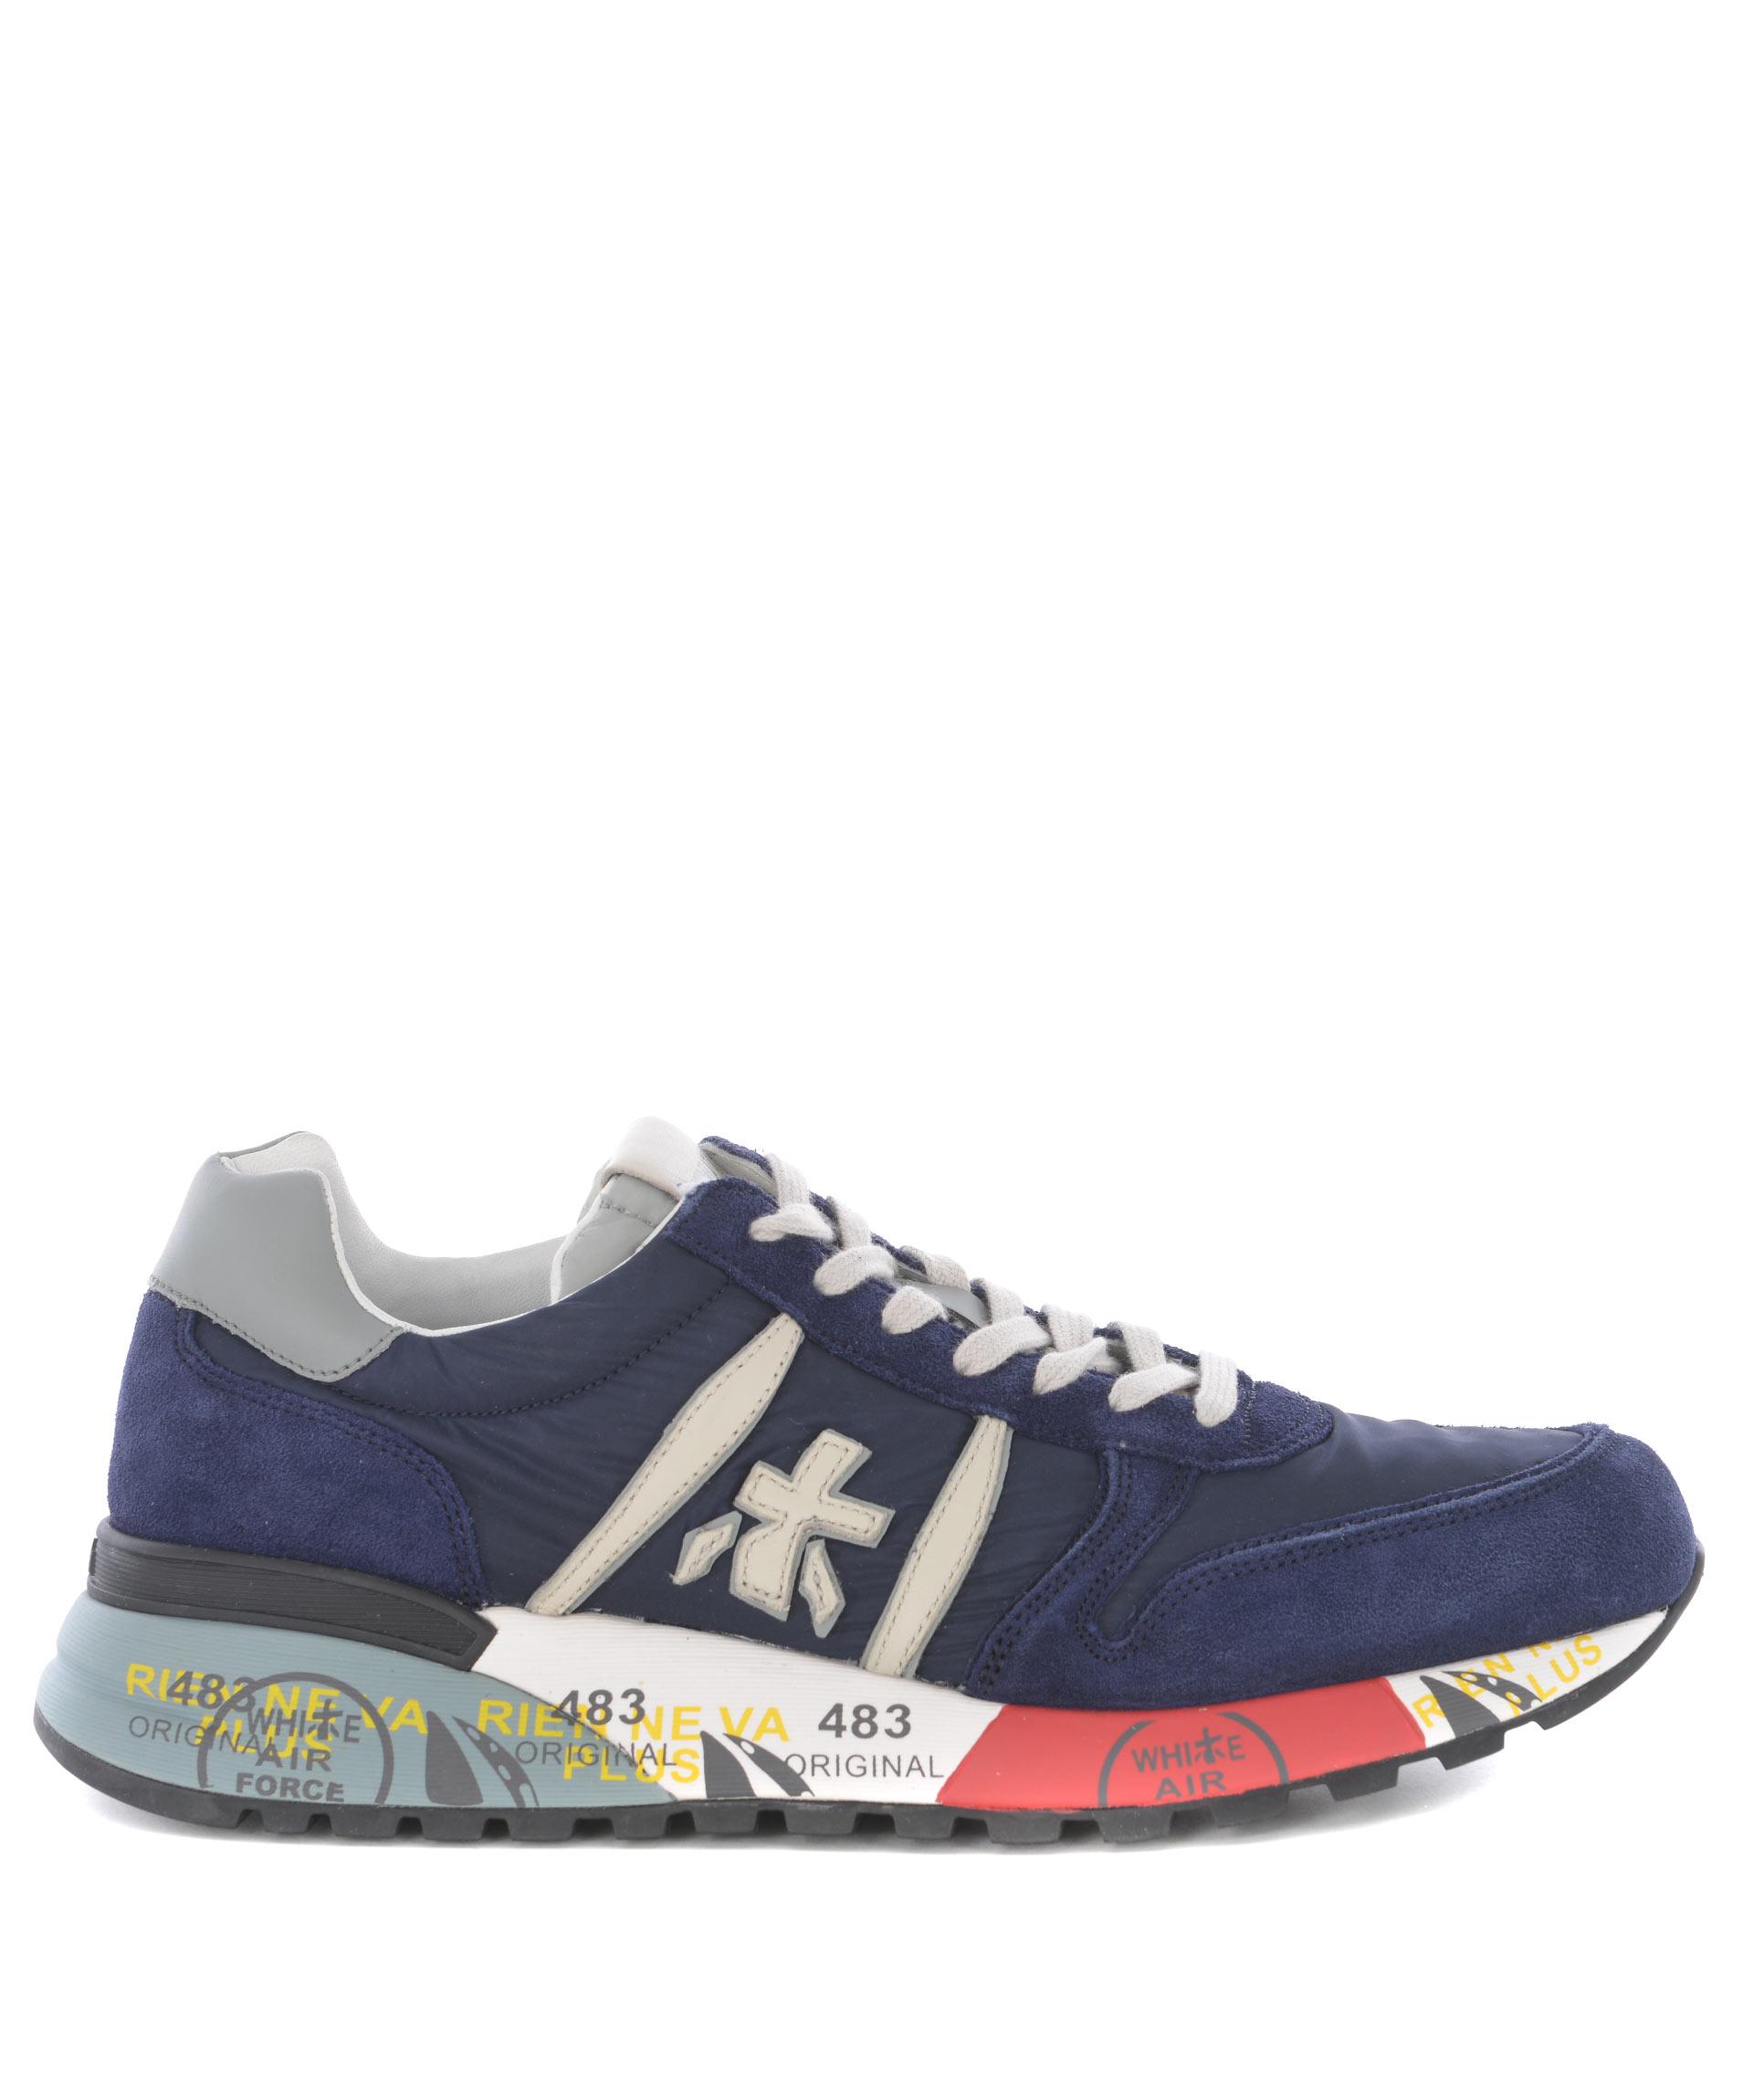 buy online 7665d 194ae Sneakers uomo Premiata